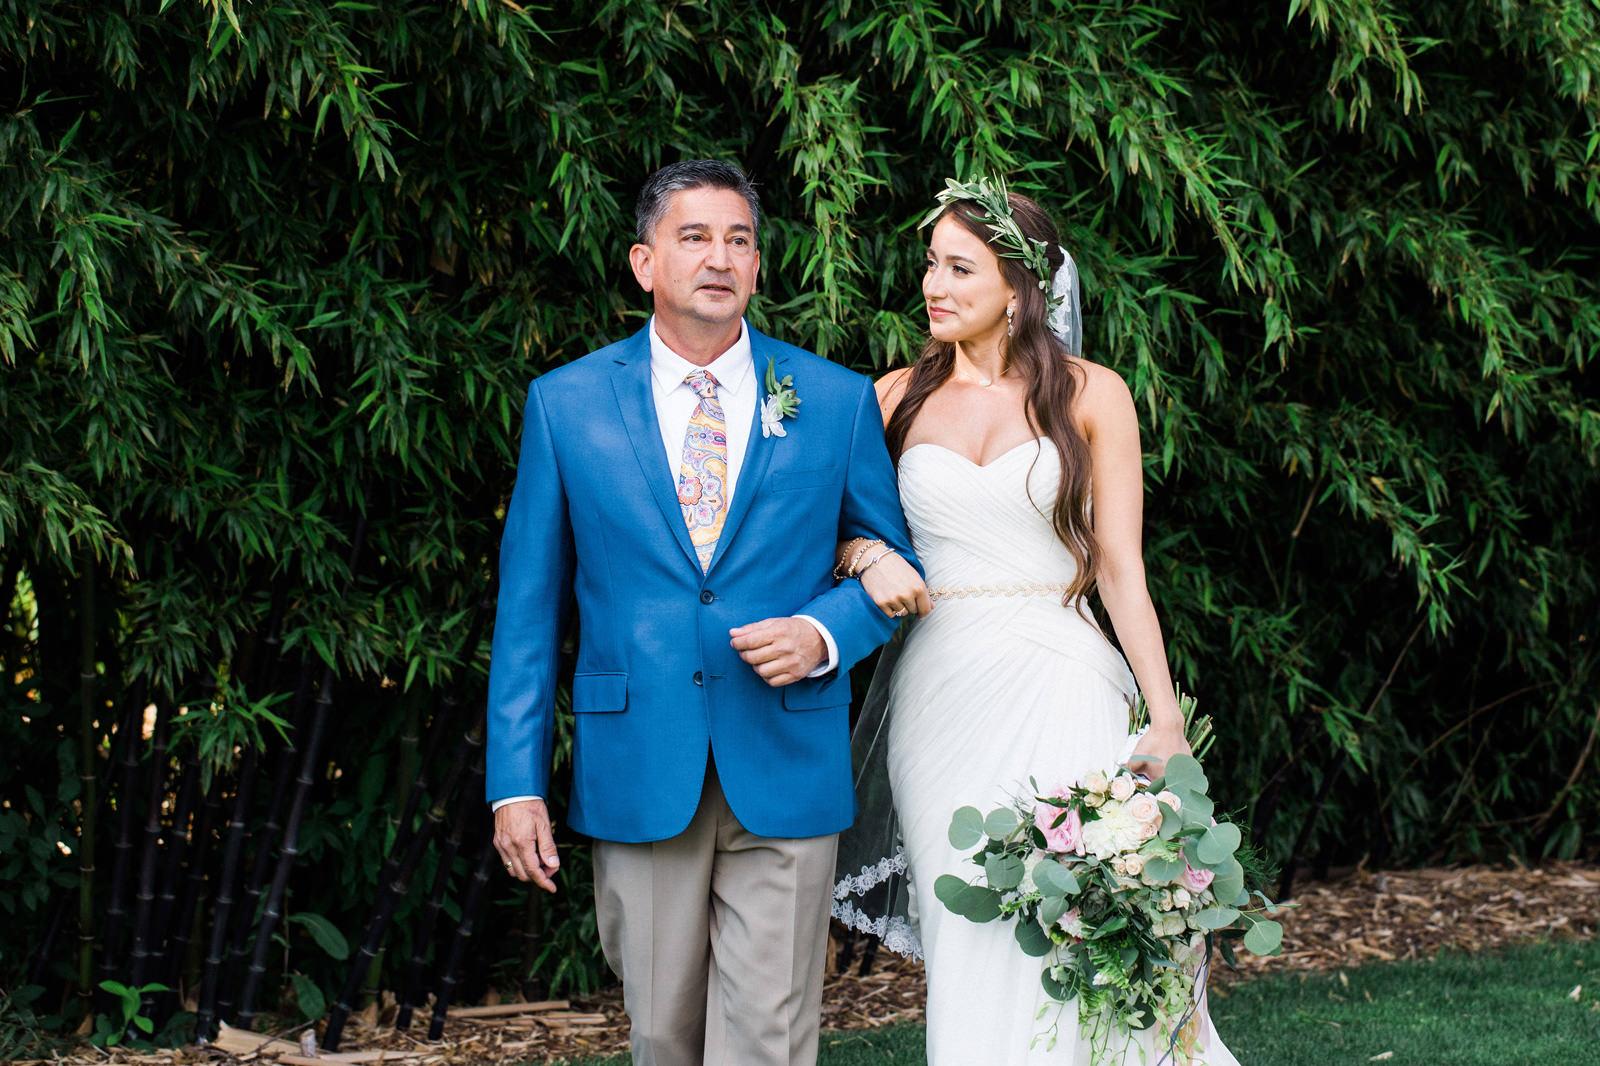 036-woodinville-lavendar-farm-wedding-with-golden-glowy-photos.jpg